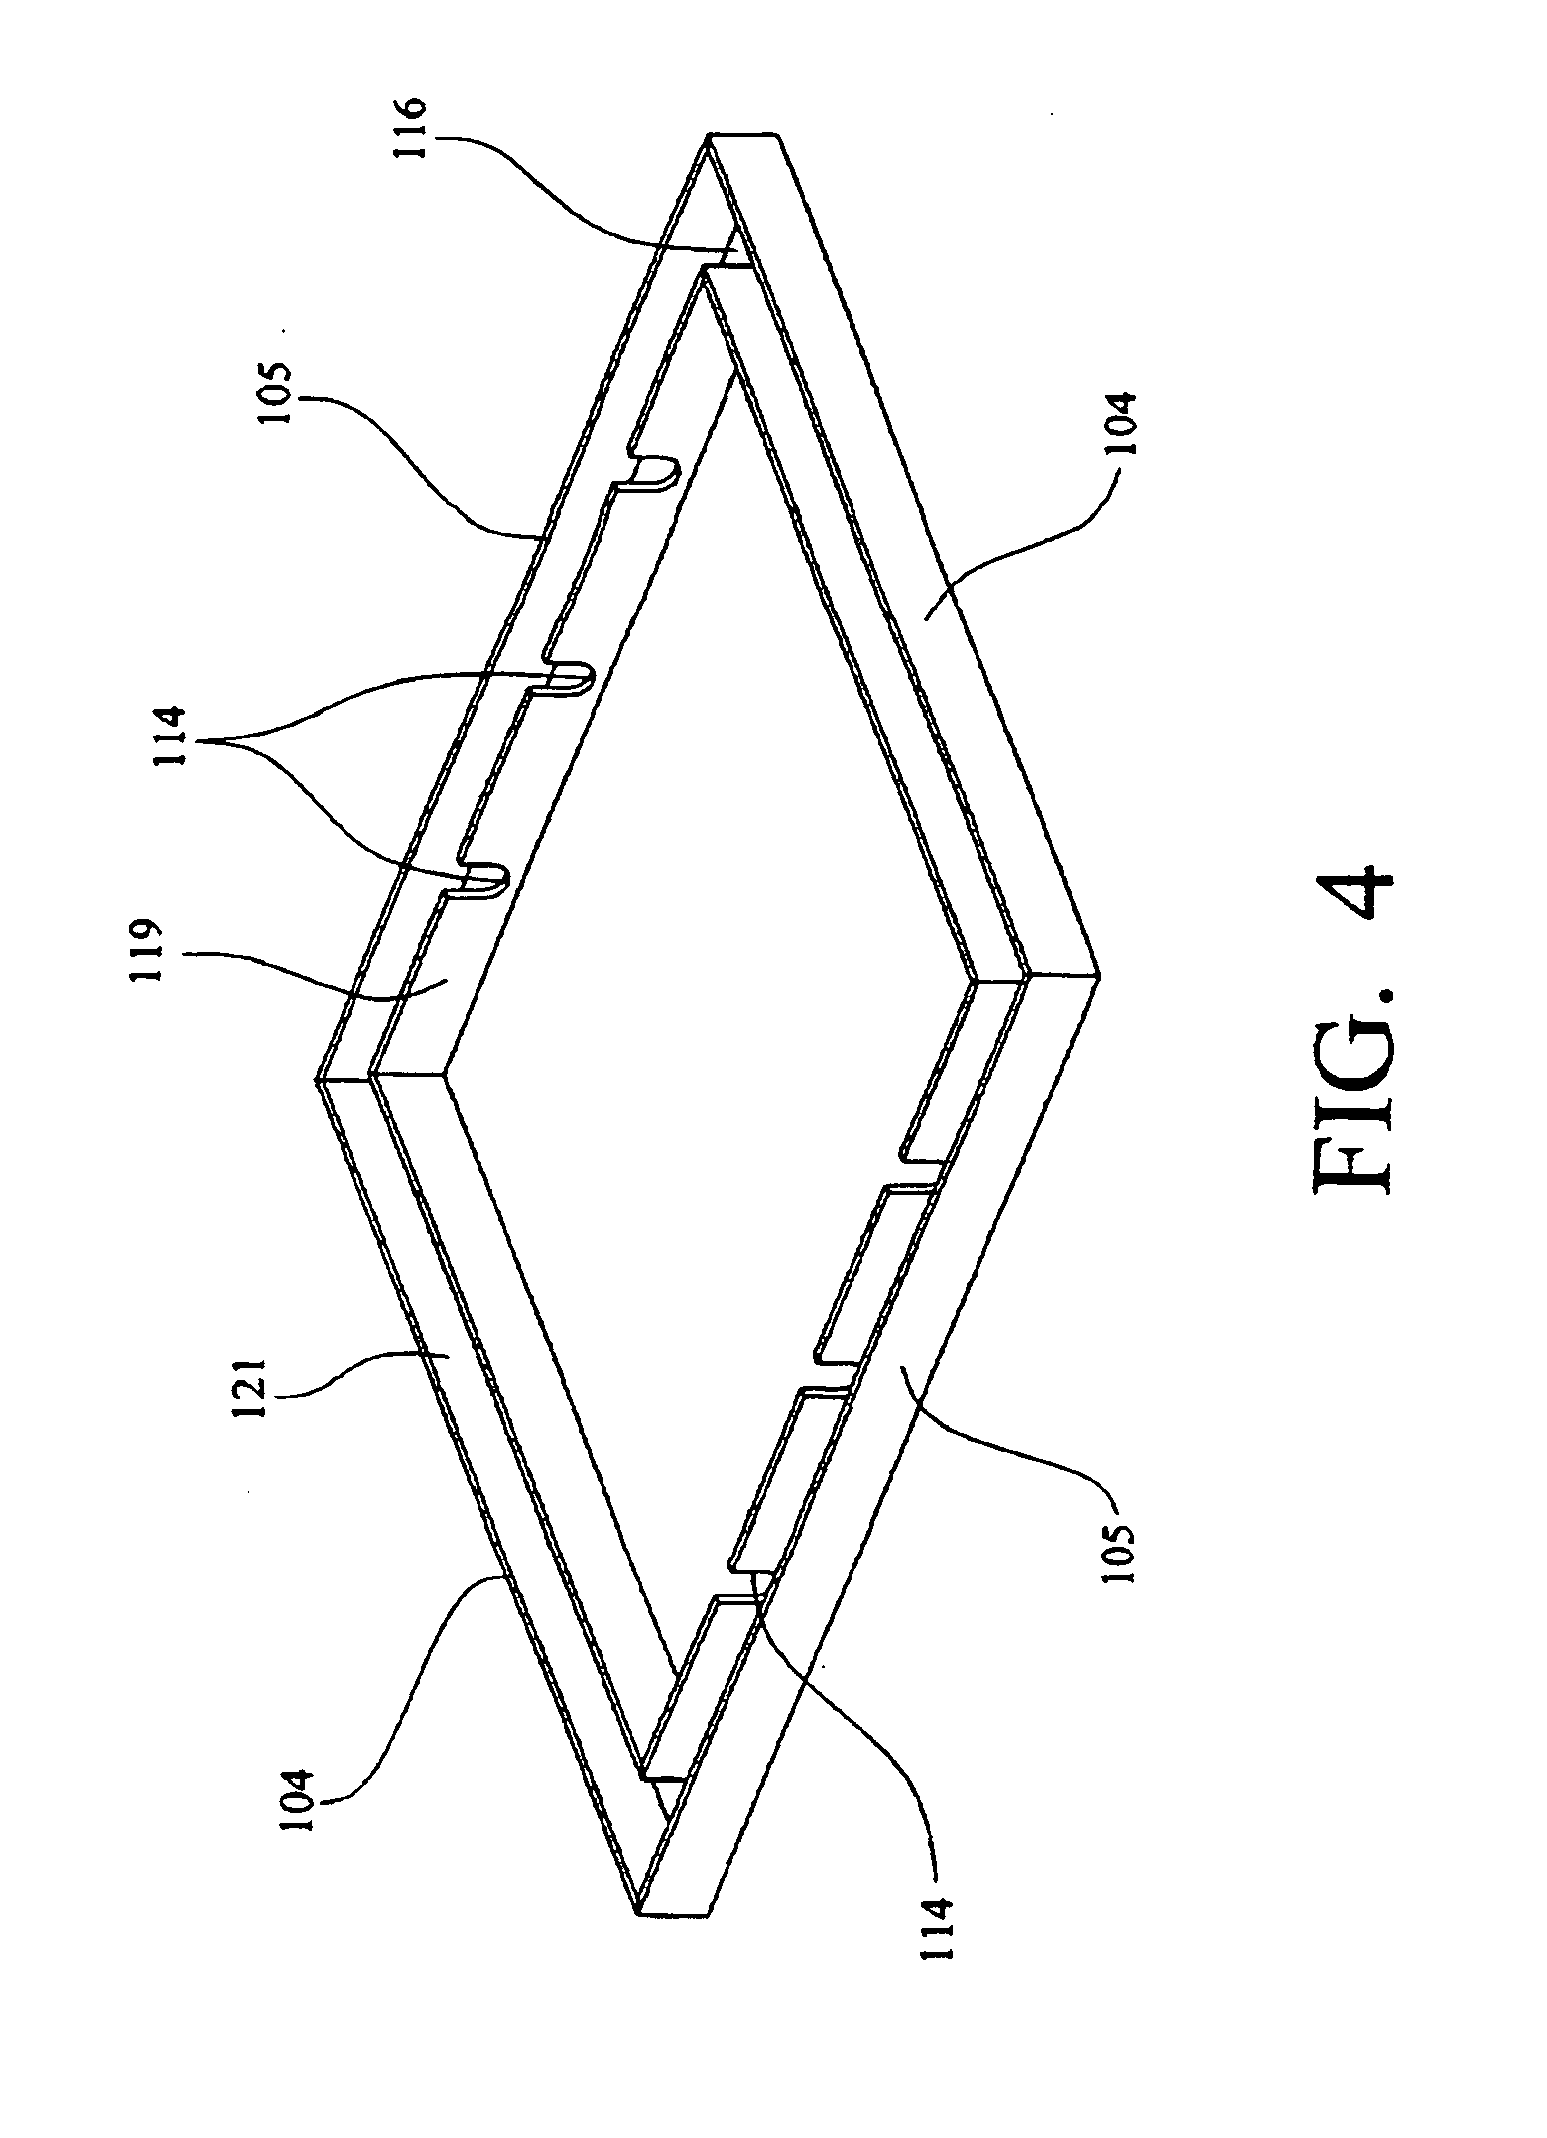 Patente EP B1 Method of making a marine gas turbine filter